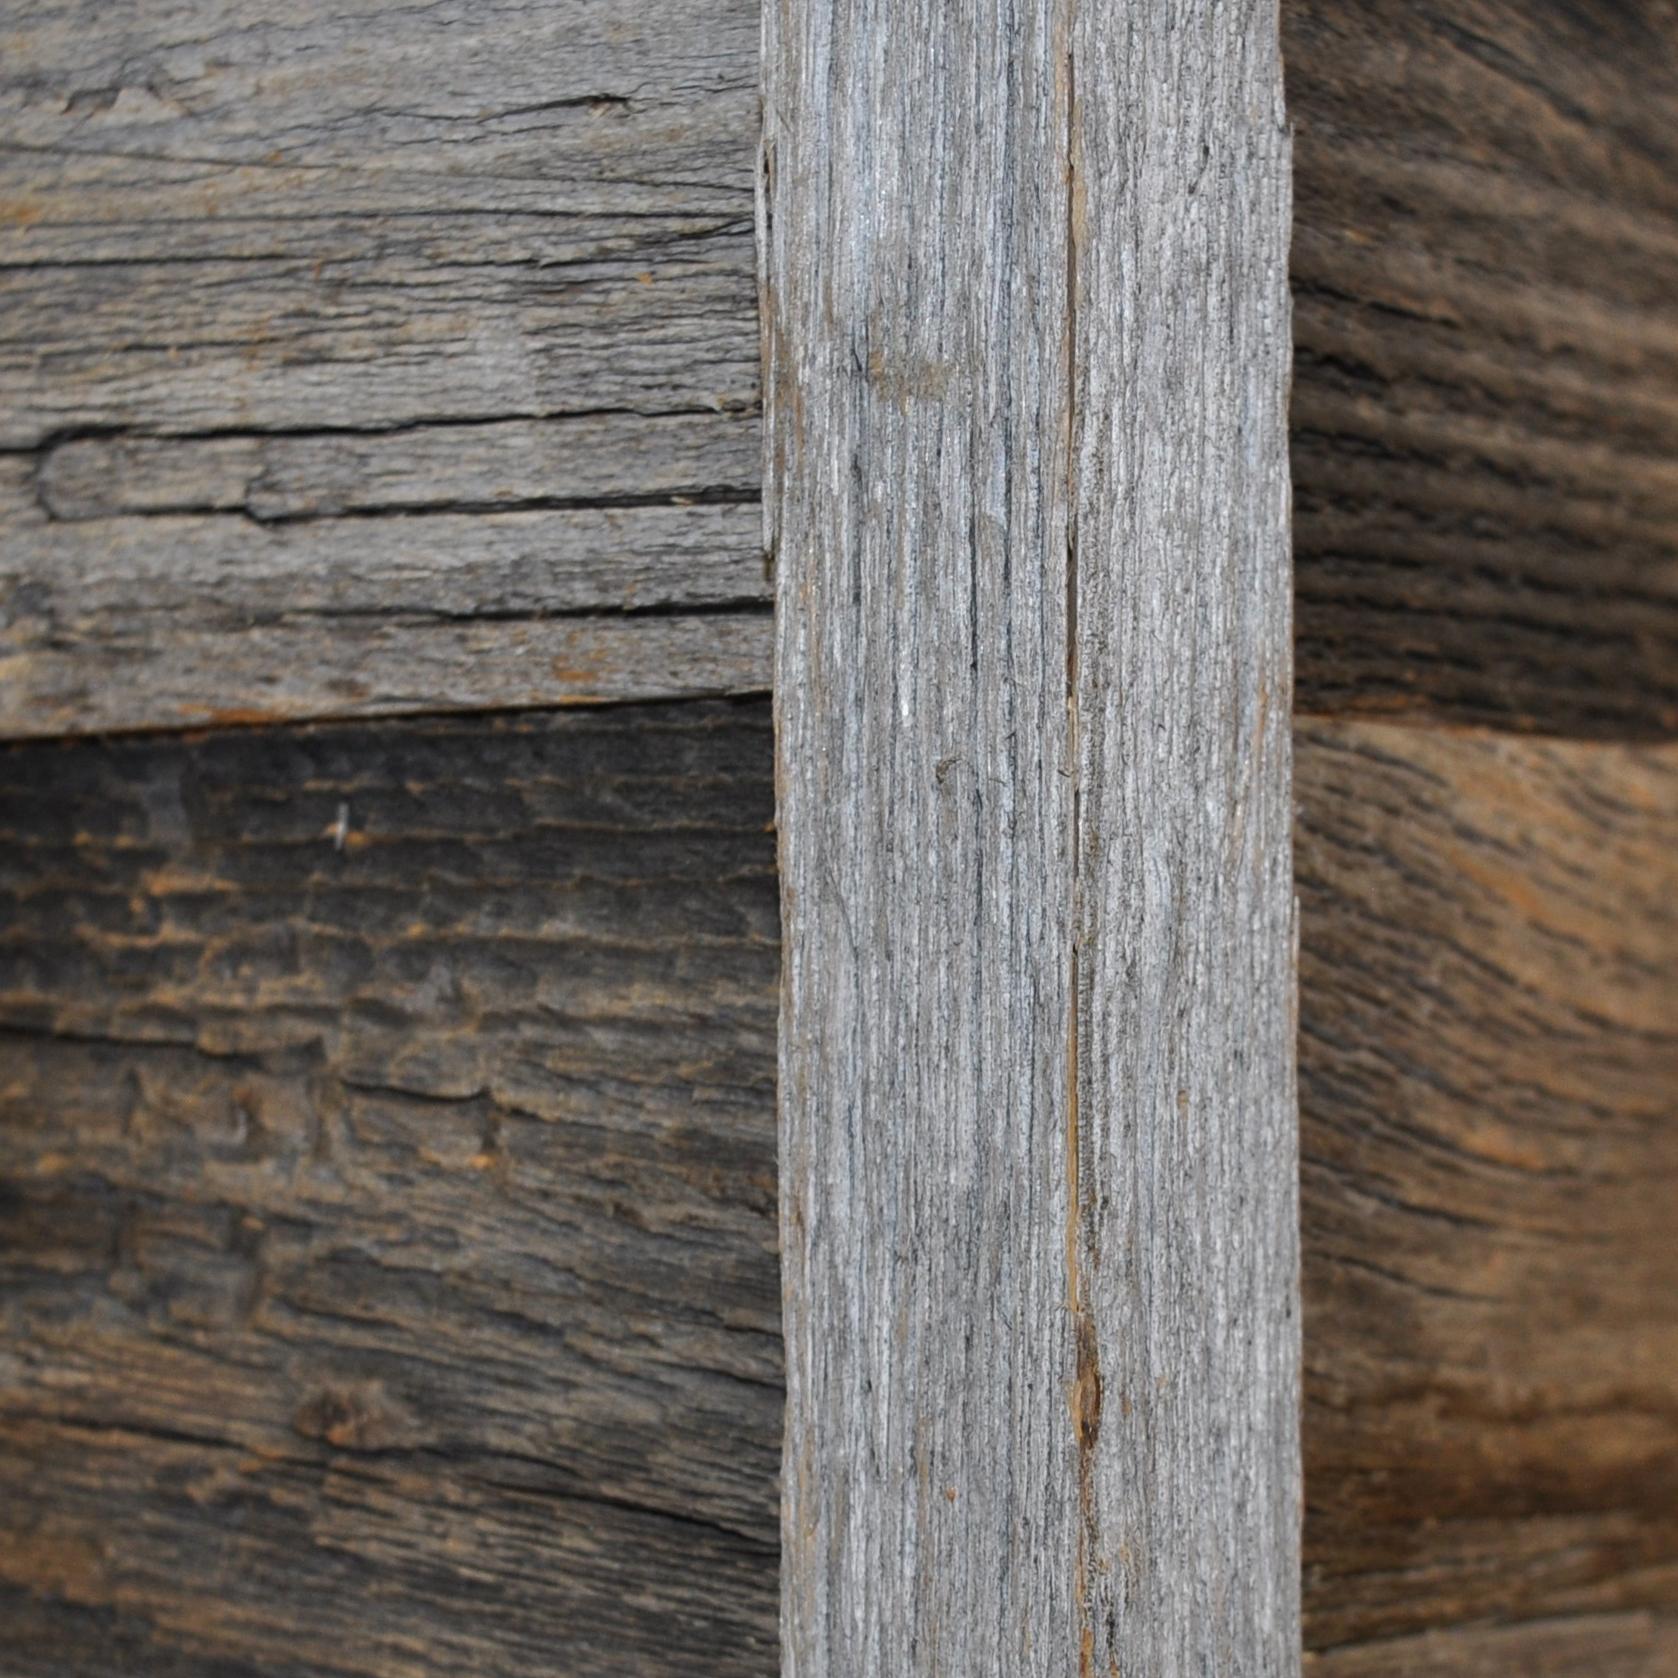 Diy Reclaimed Barn Wood Outside Corner Trim In Brown Or Grey To Cover Cut Edges Of A Corner East Coast Rustic